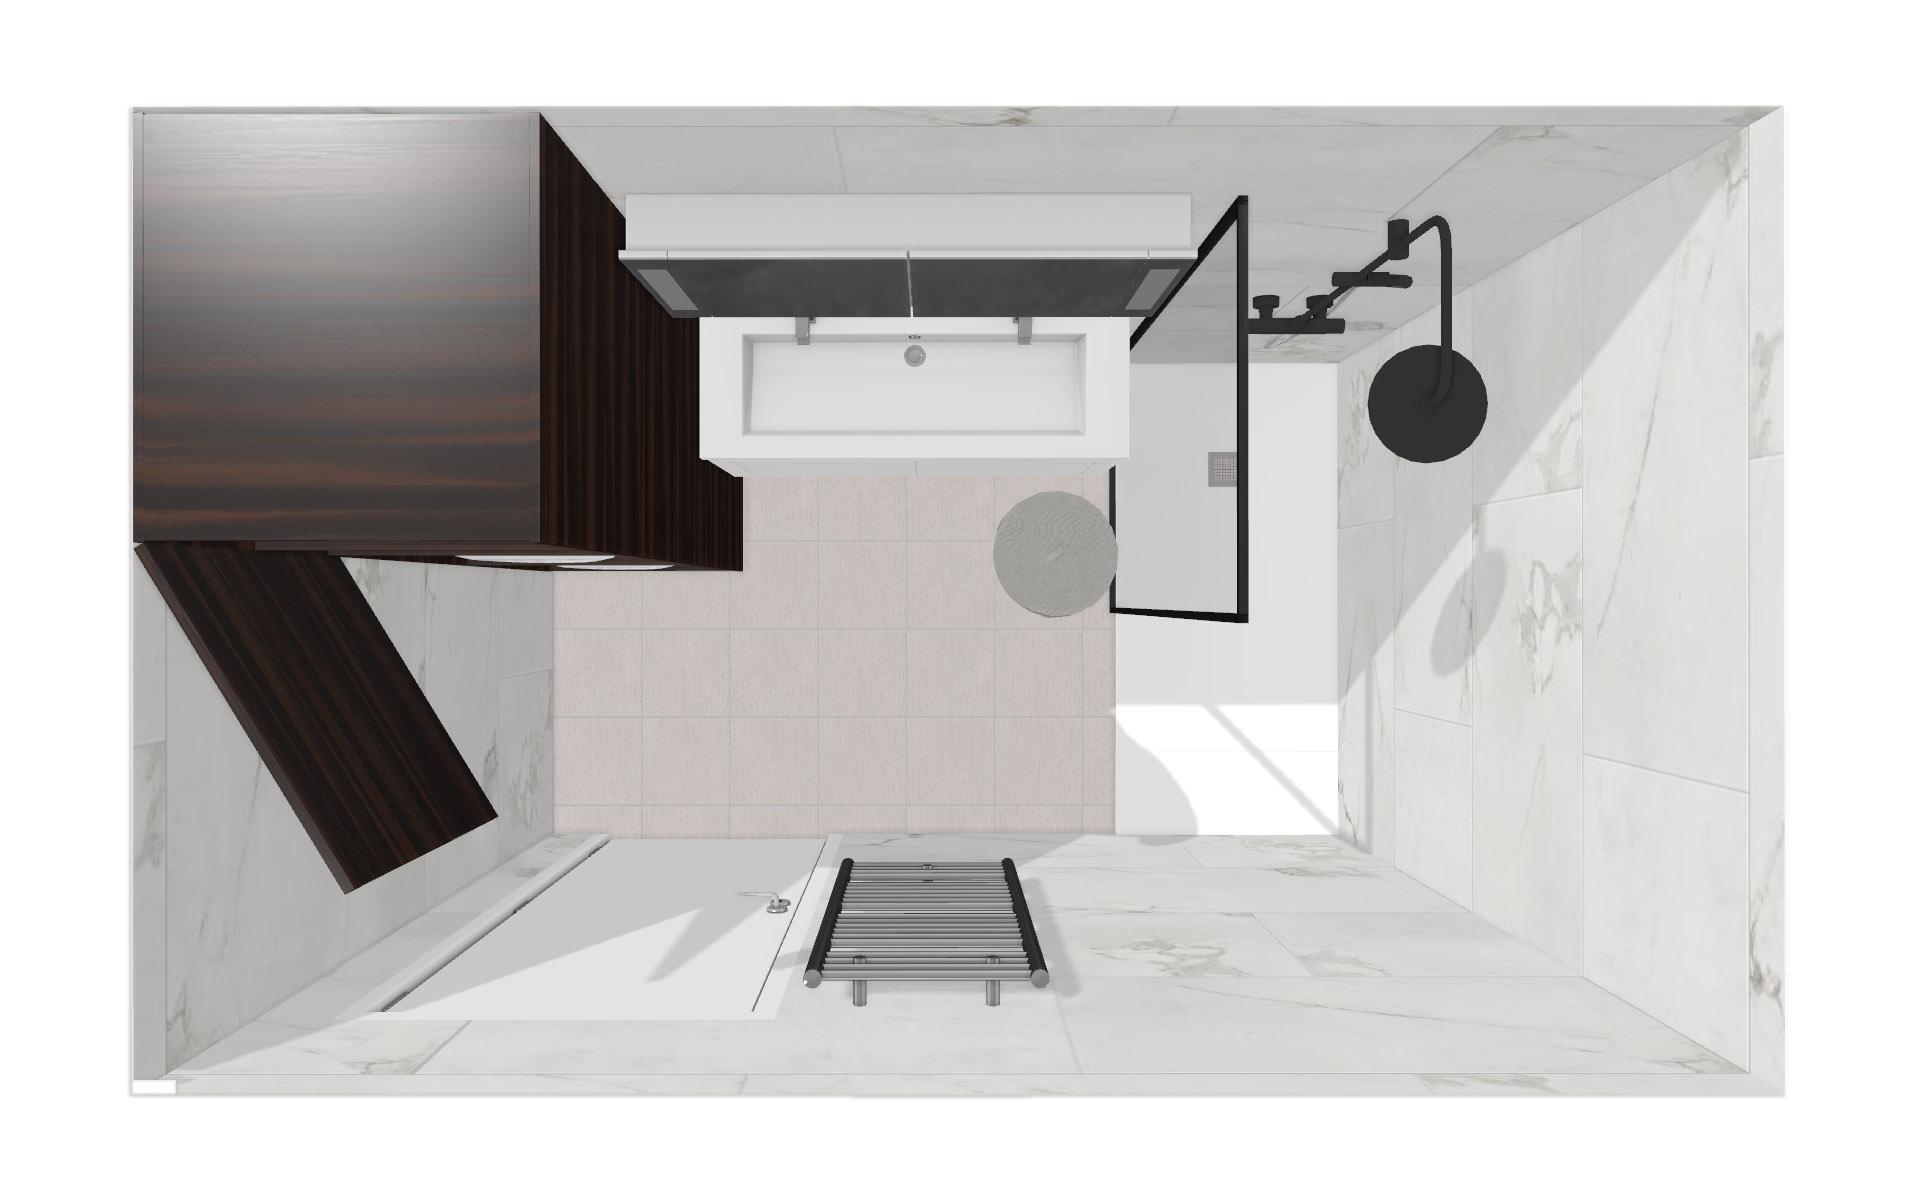 Volumétrie salle de bains